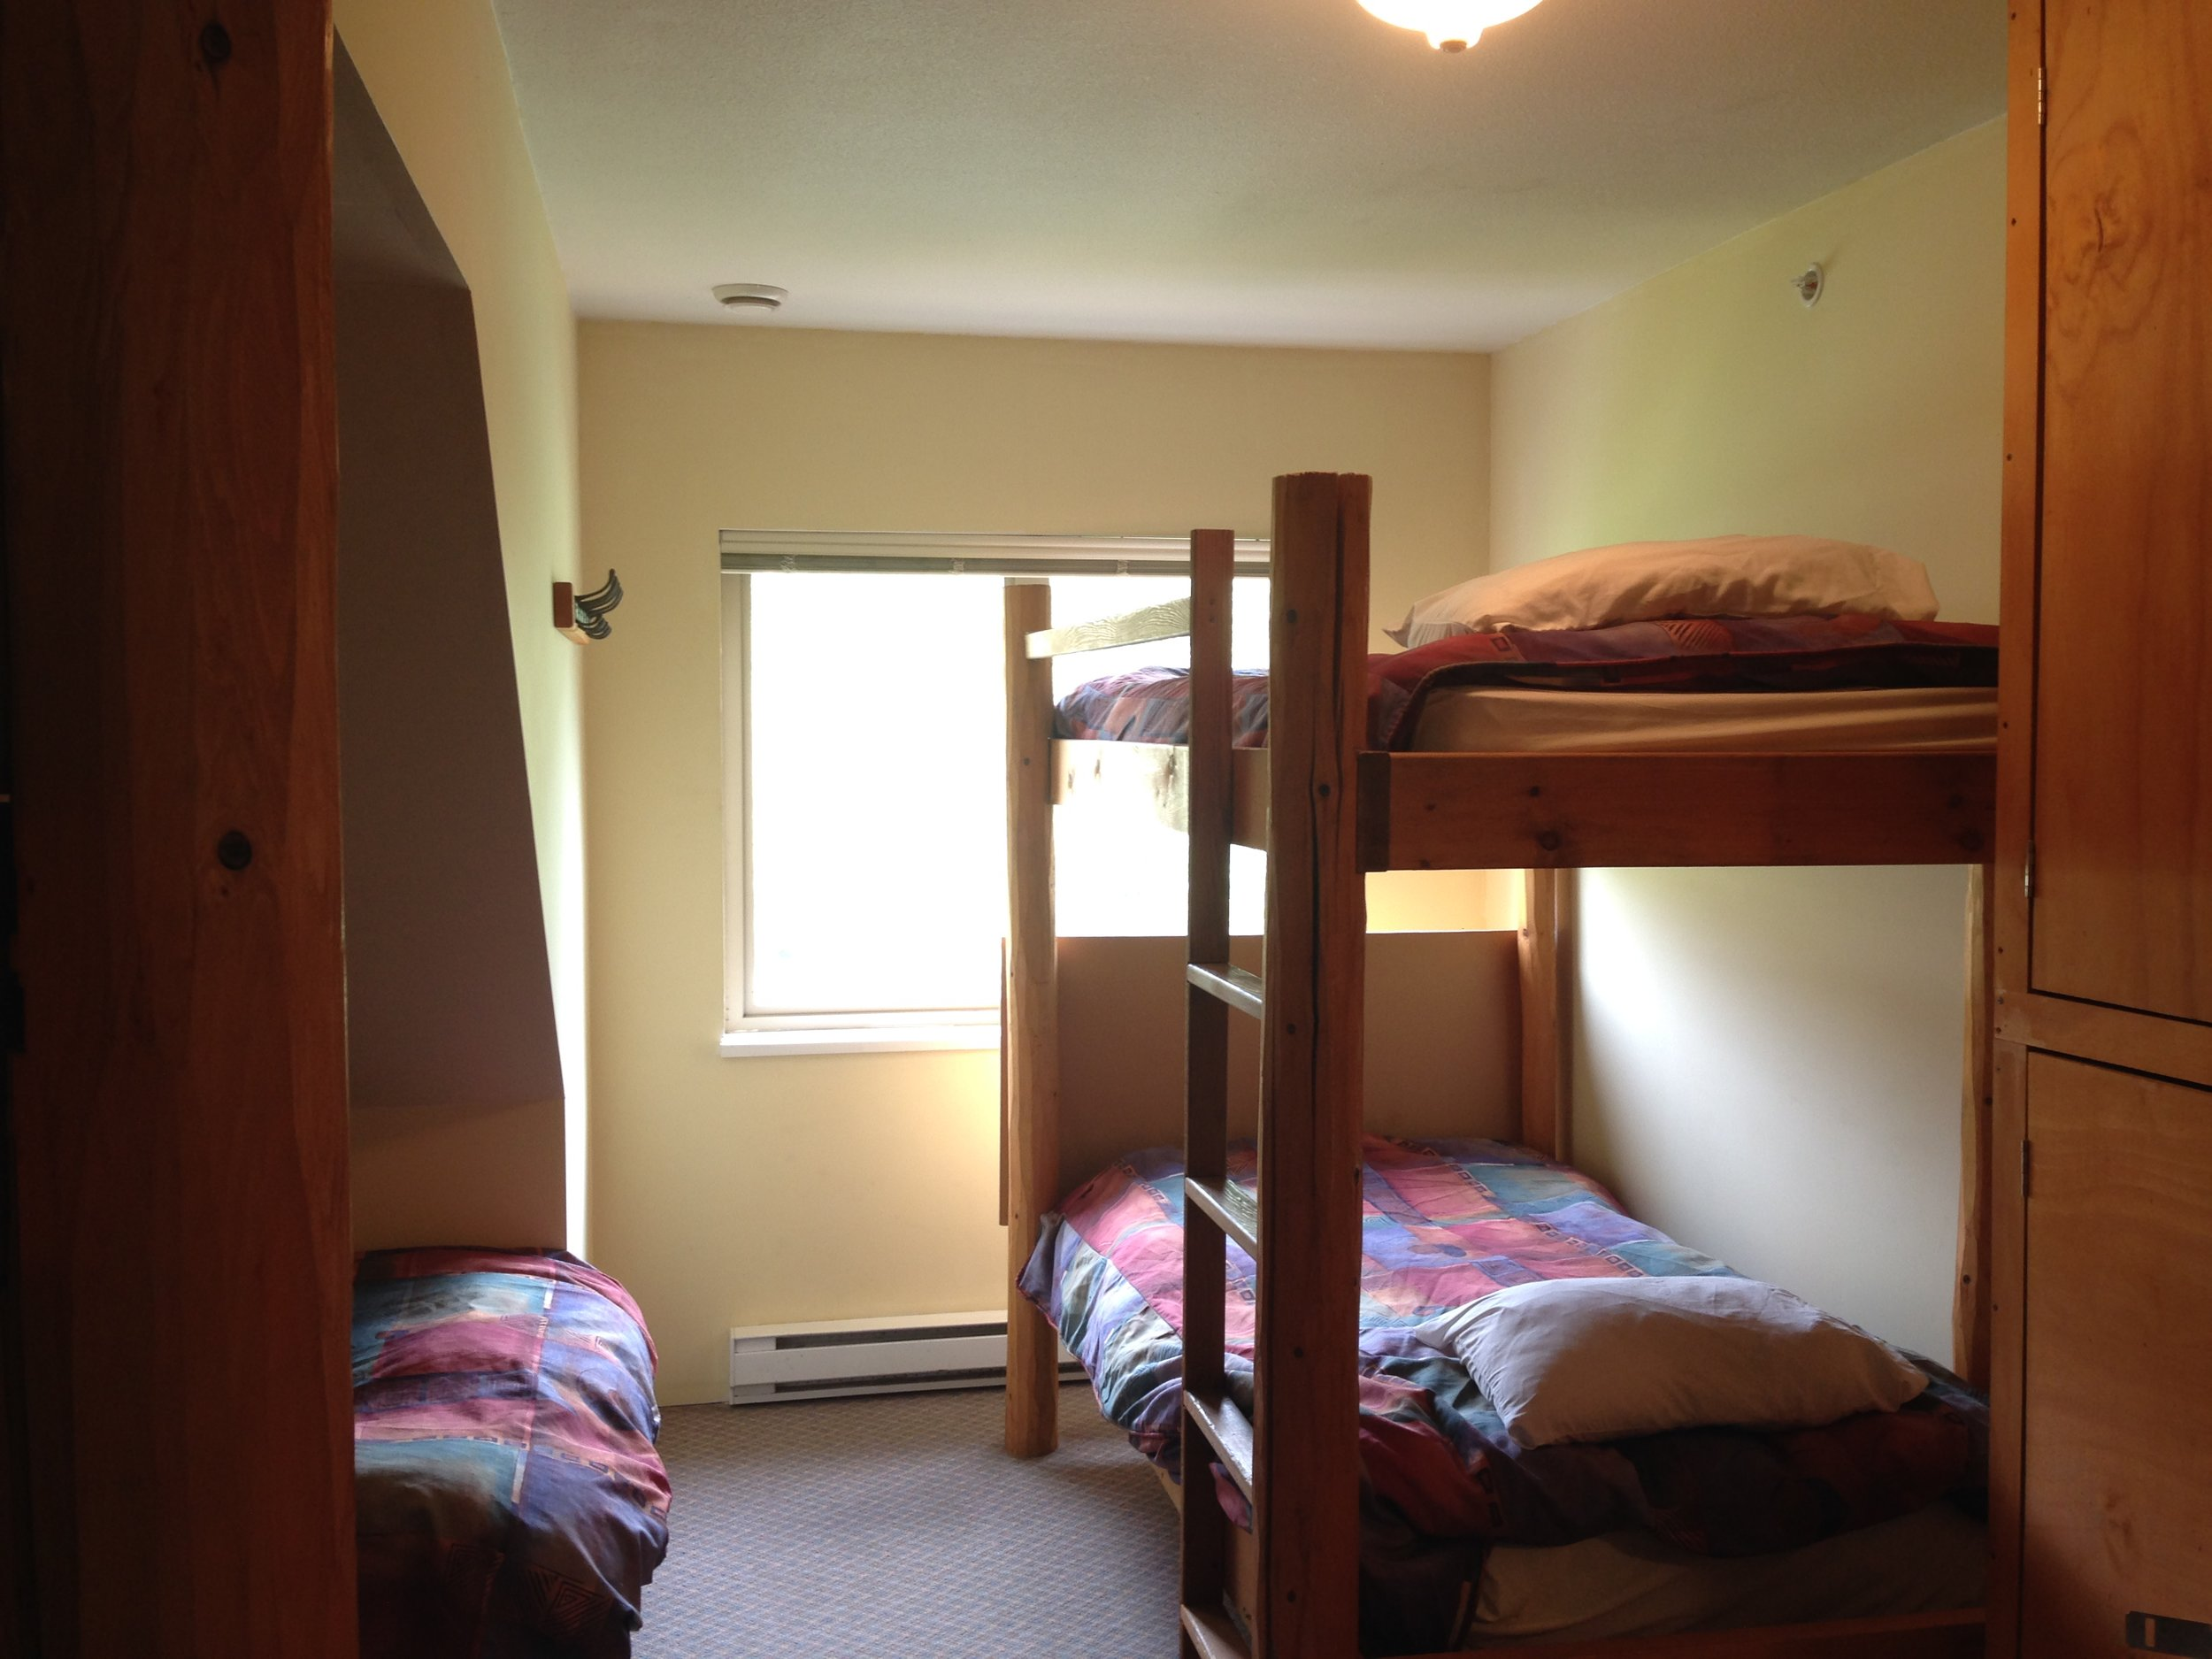 Room 307 window.jpeg